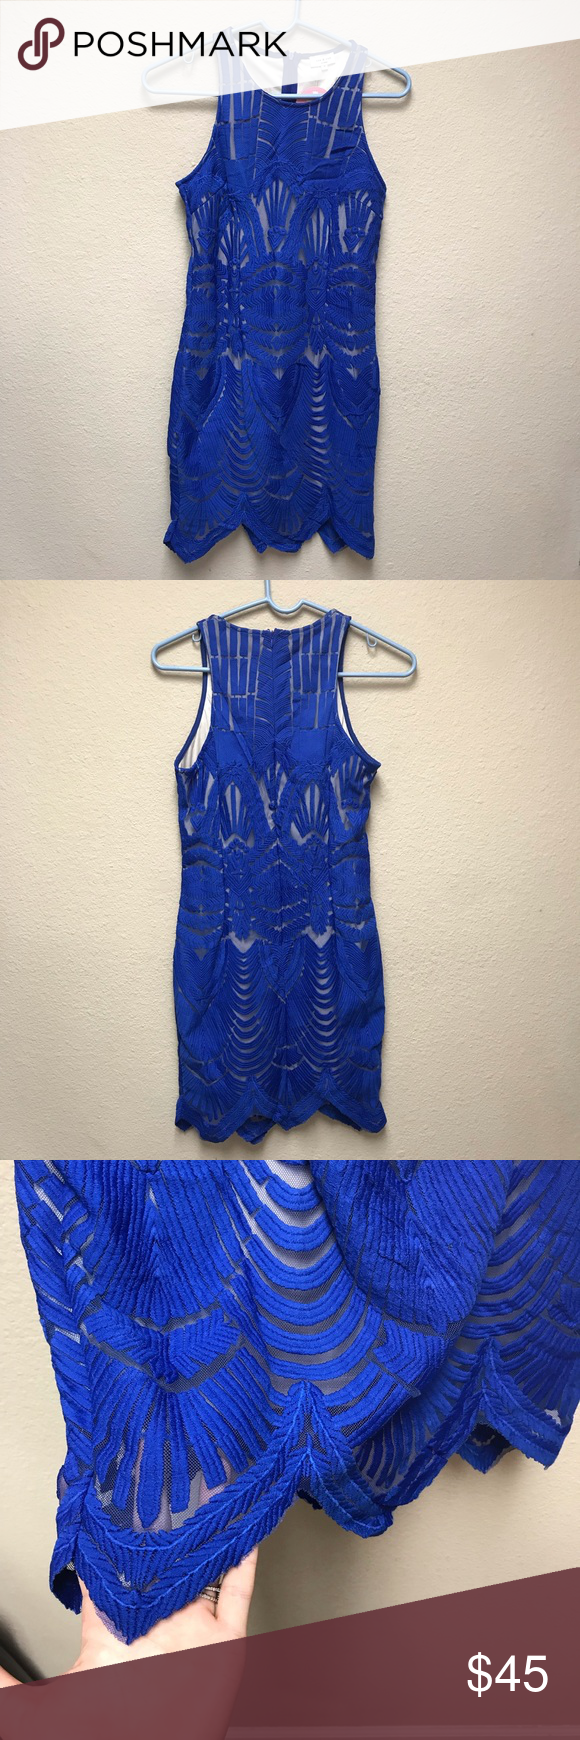 24+ Cobalt blue and cream lace dress inspirations